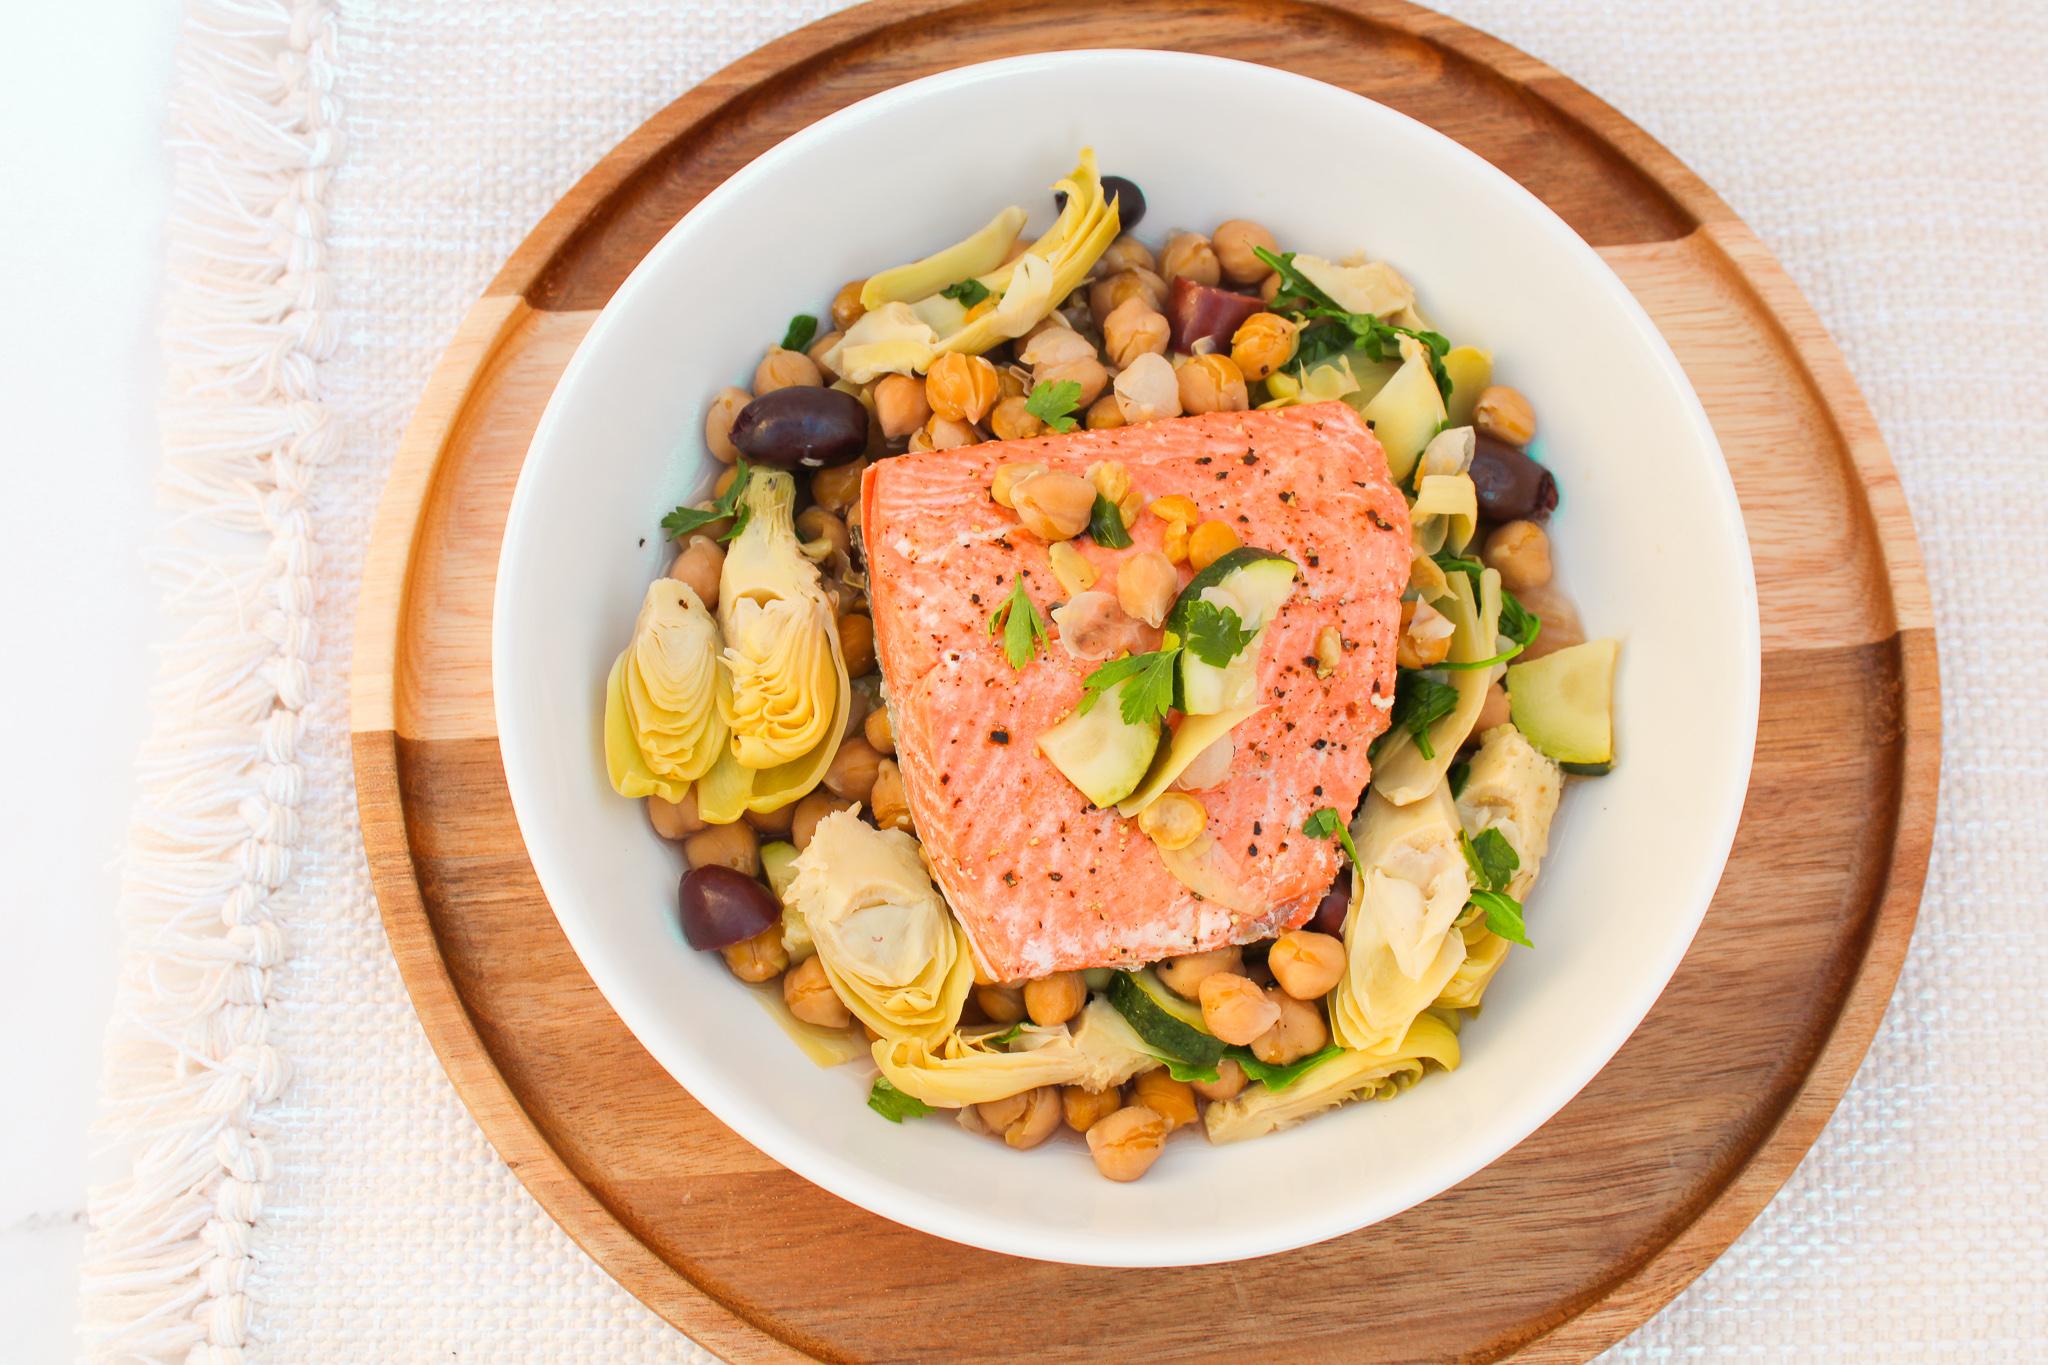 Mediterranean Salmon & Artichokes